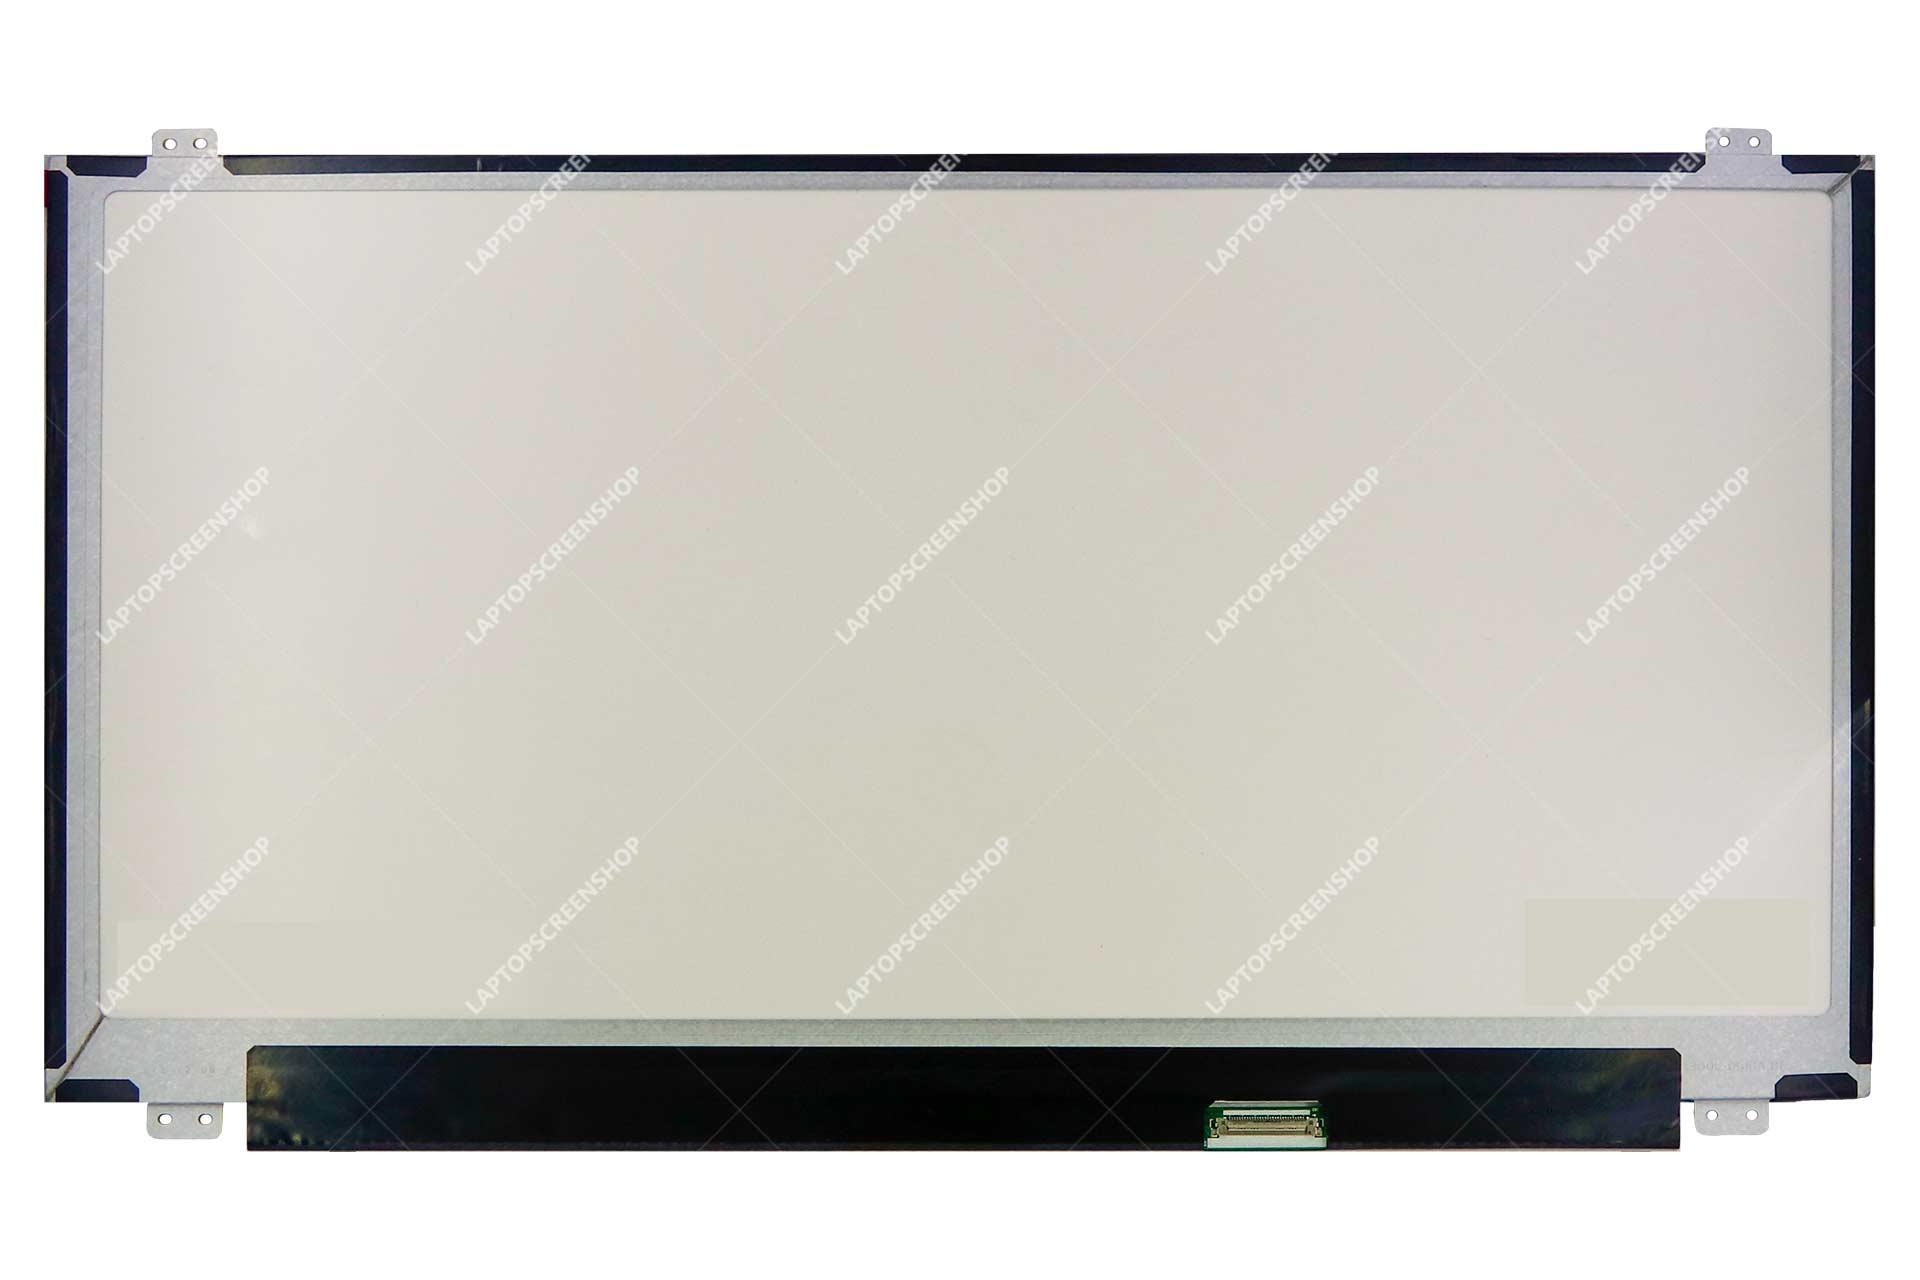 LENOVO-IDEAPAD-Z510-59400196-LCD |HD|فروشگاه لپ تاپ اسکرين | تعمير لپ تاپ